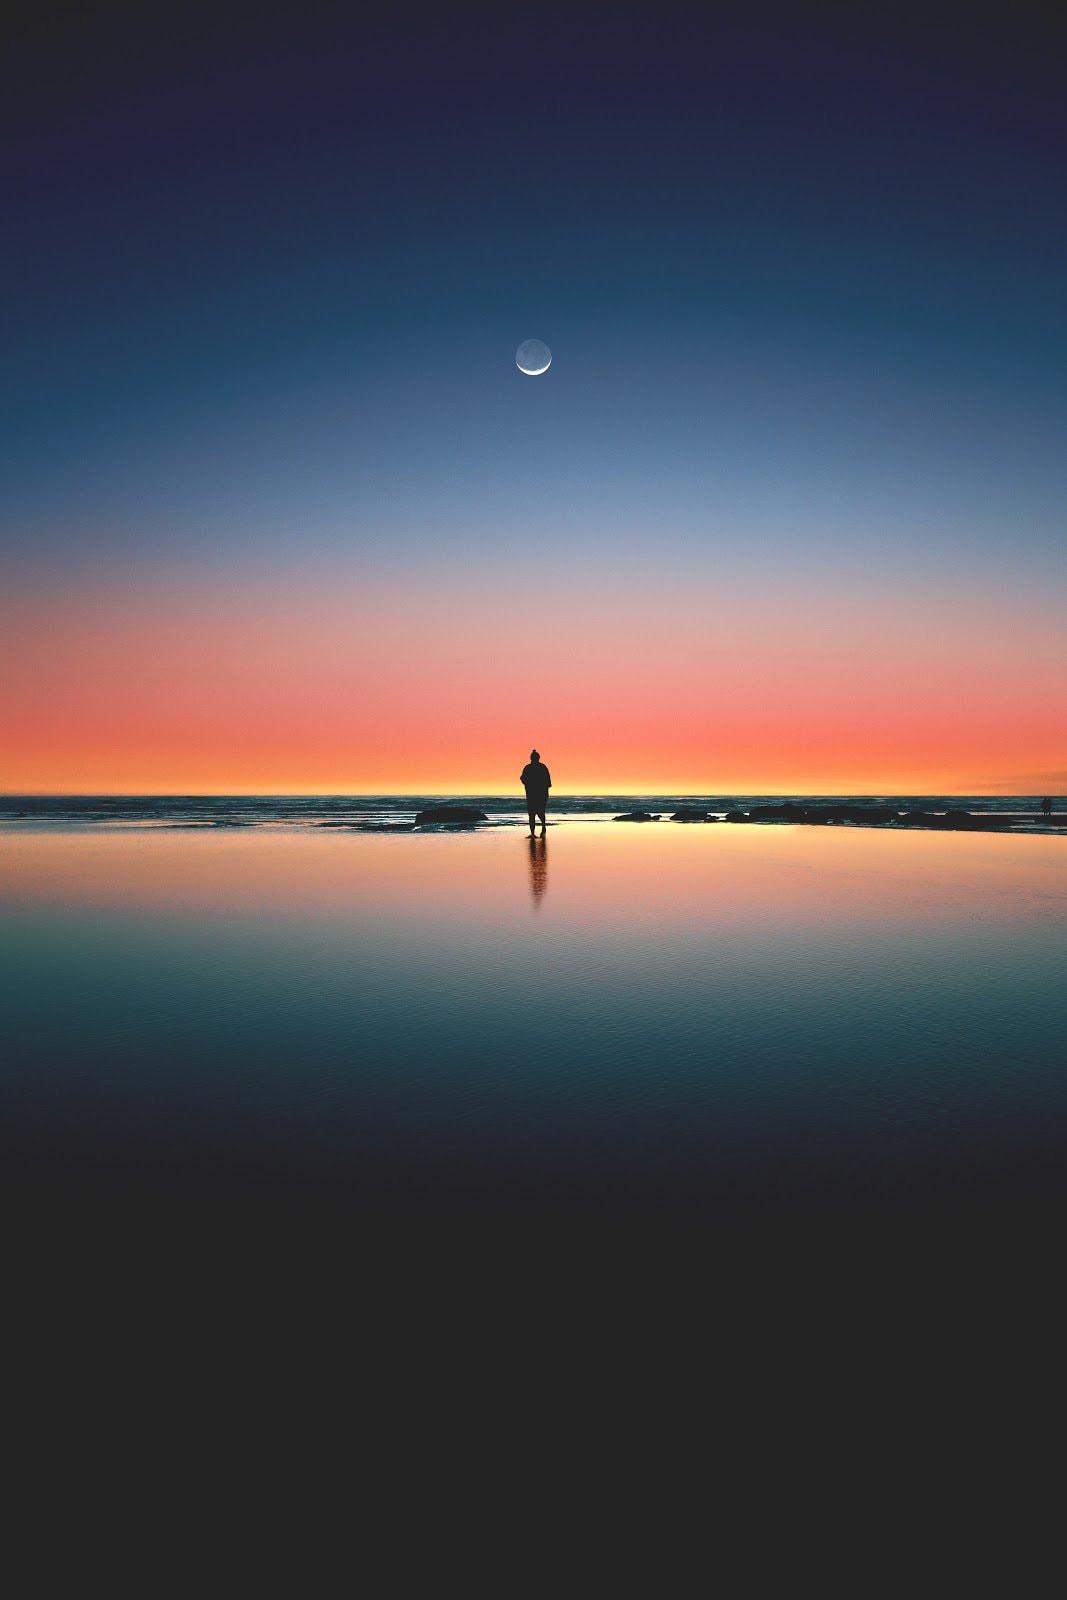 Person standing on a beach using a long exposure shot phot by Jordan Steranka